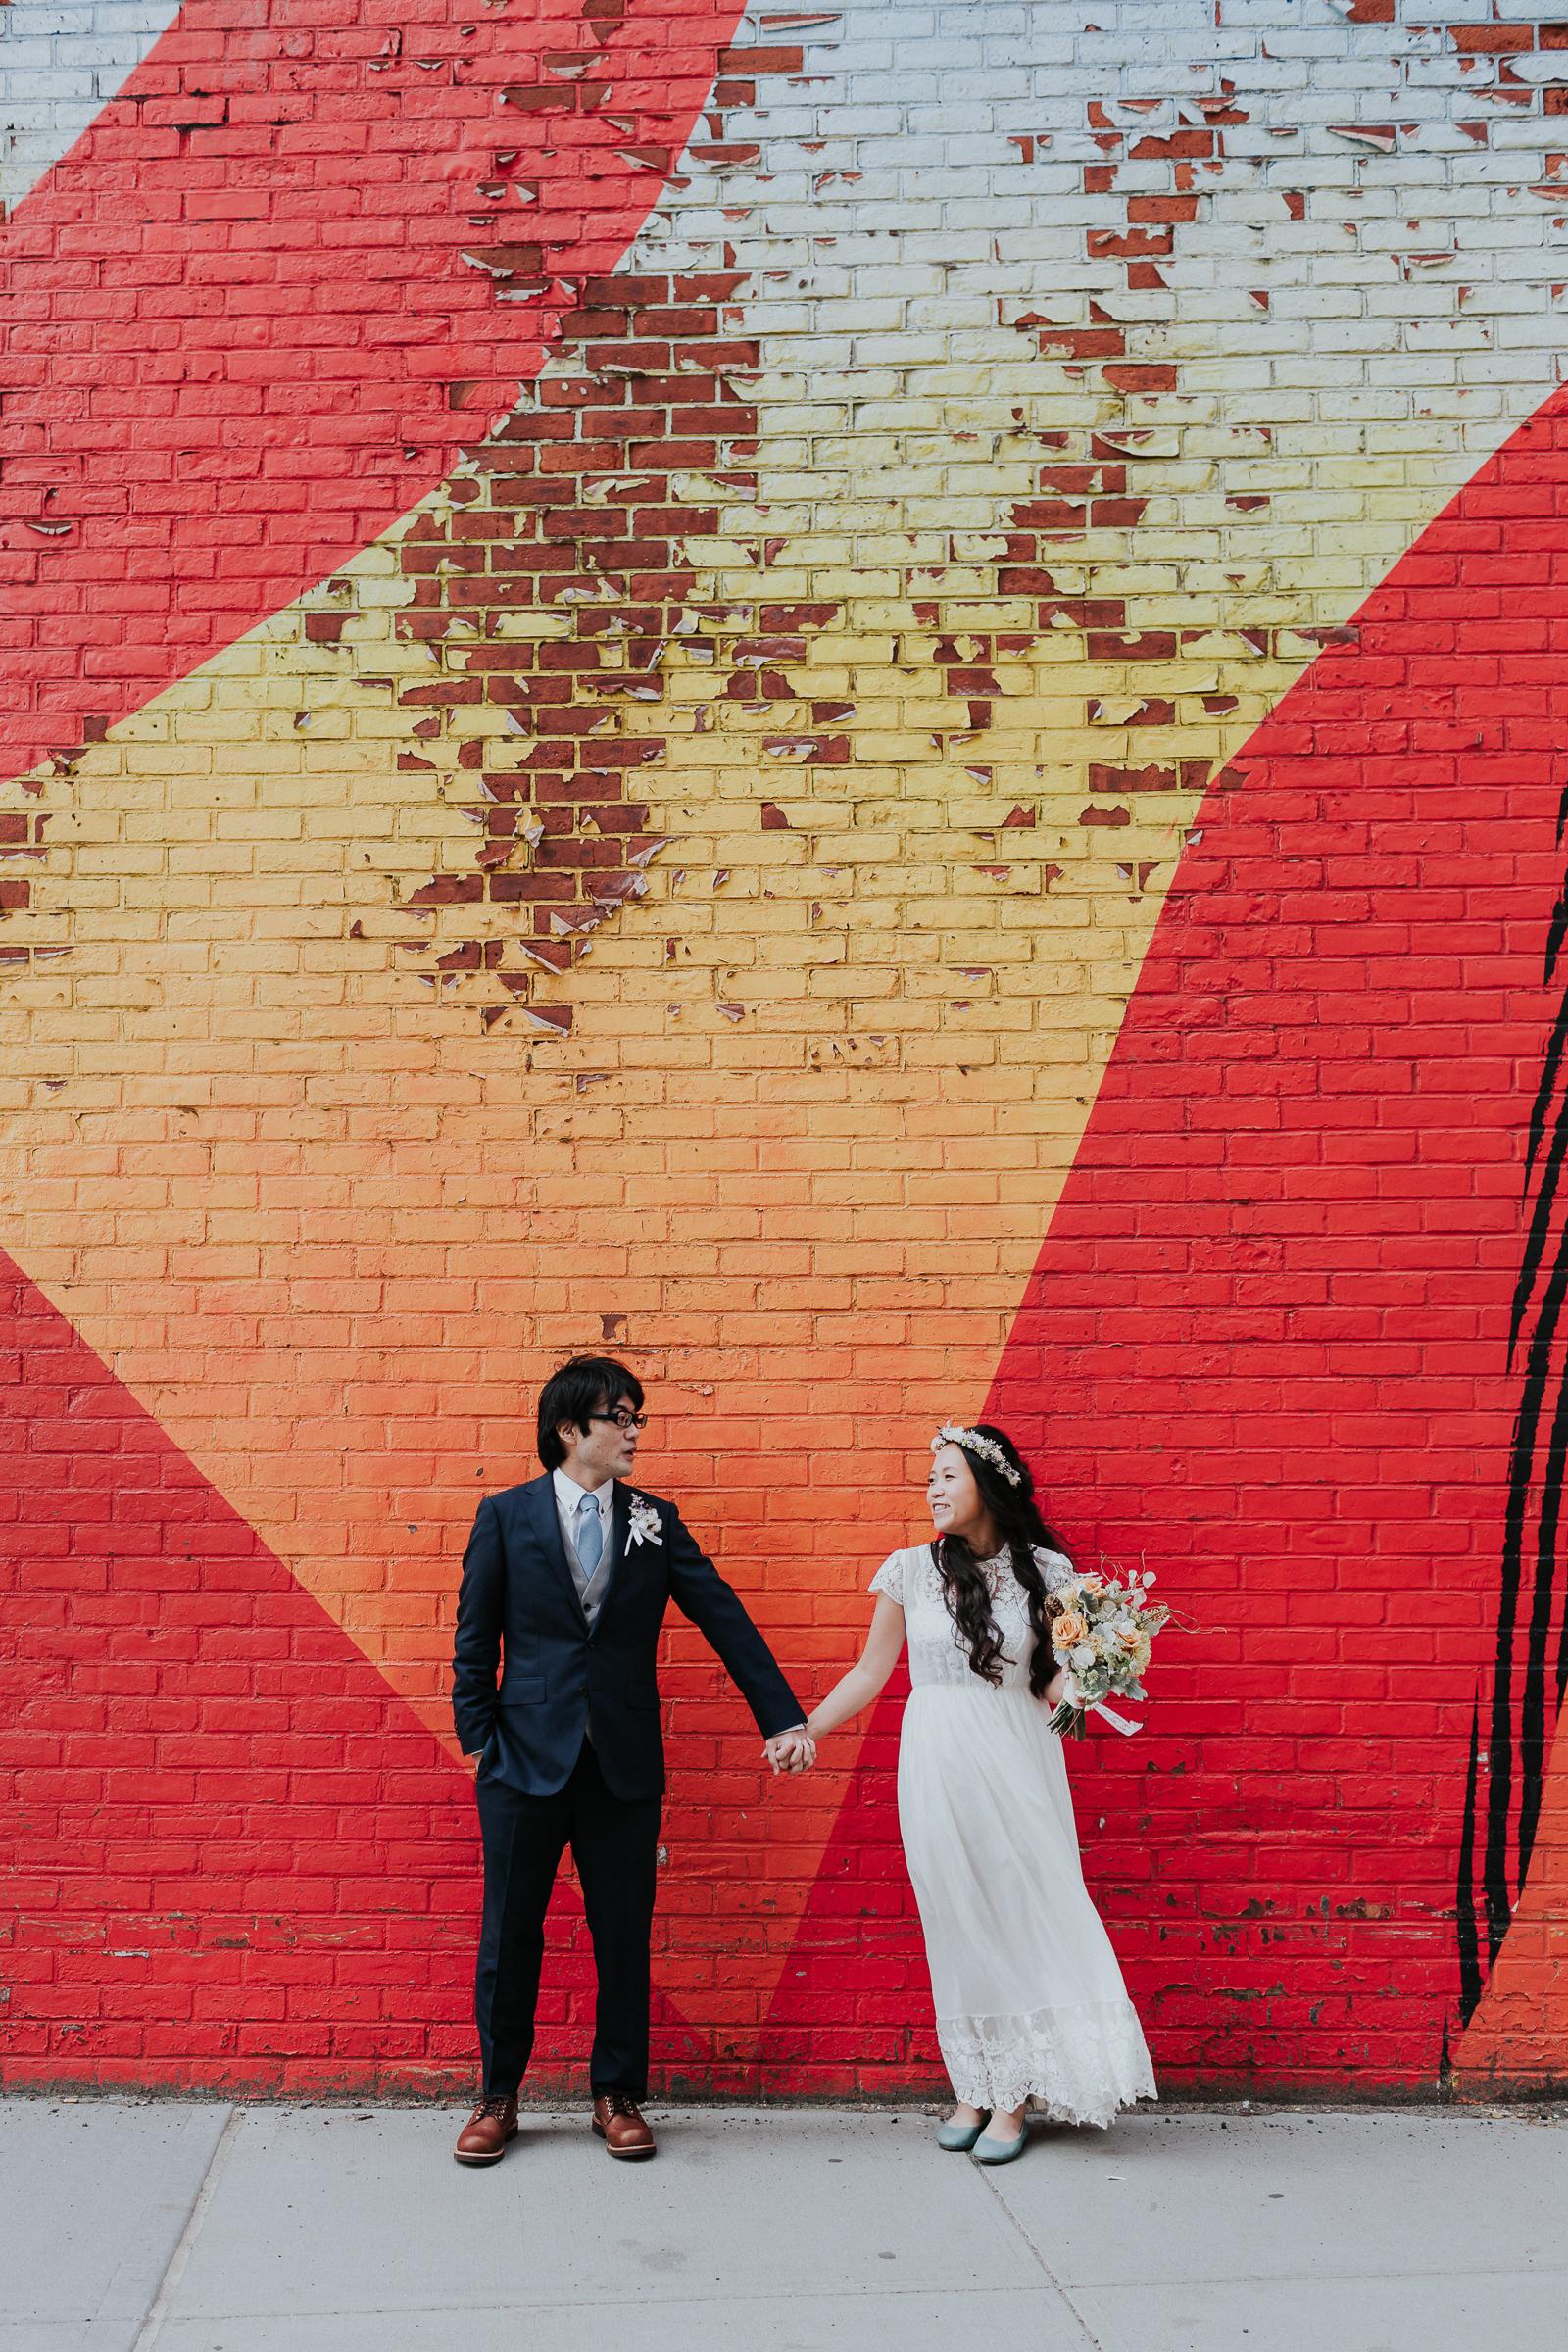 Central-Park-Brooklyn-Bridge-Dumbo-NYC-Documentary-Wedding-Photographer-2.jpg